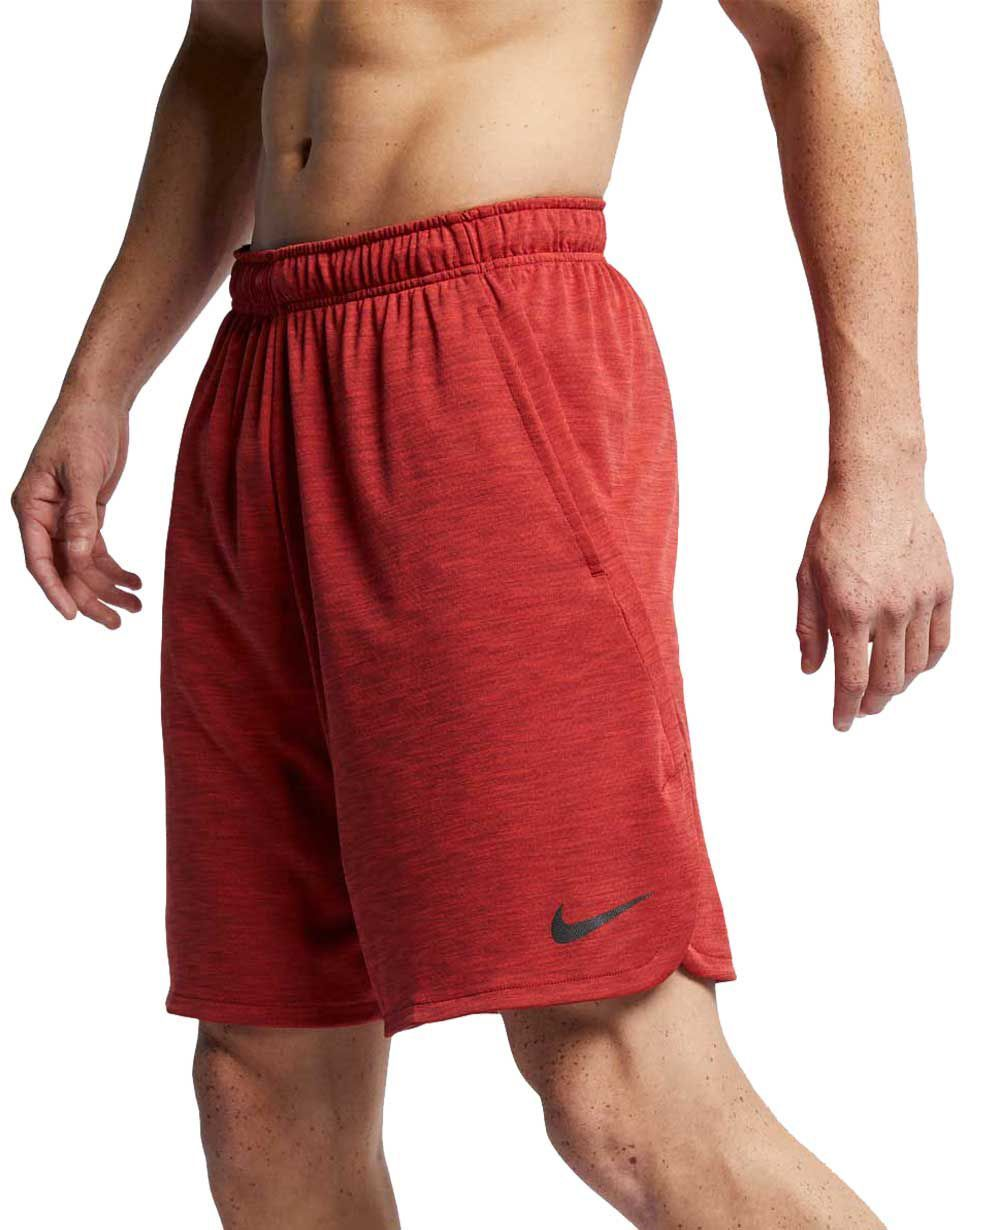 476ede0df3d8d Nike Men's Dry Veneer Training Shorts in 2019 | Products | Nike ...